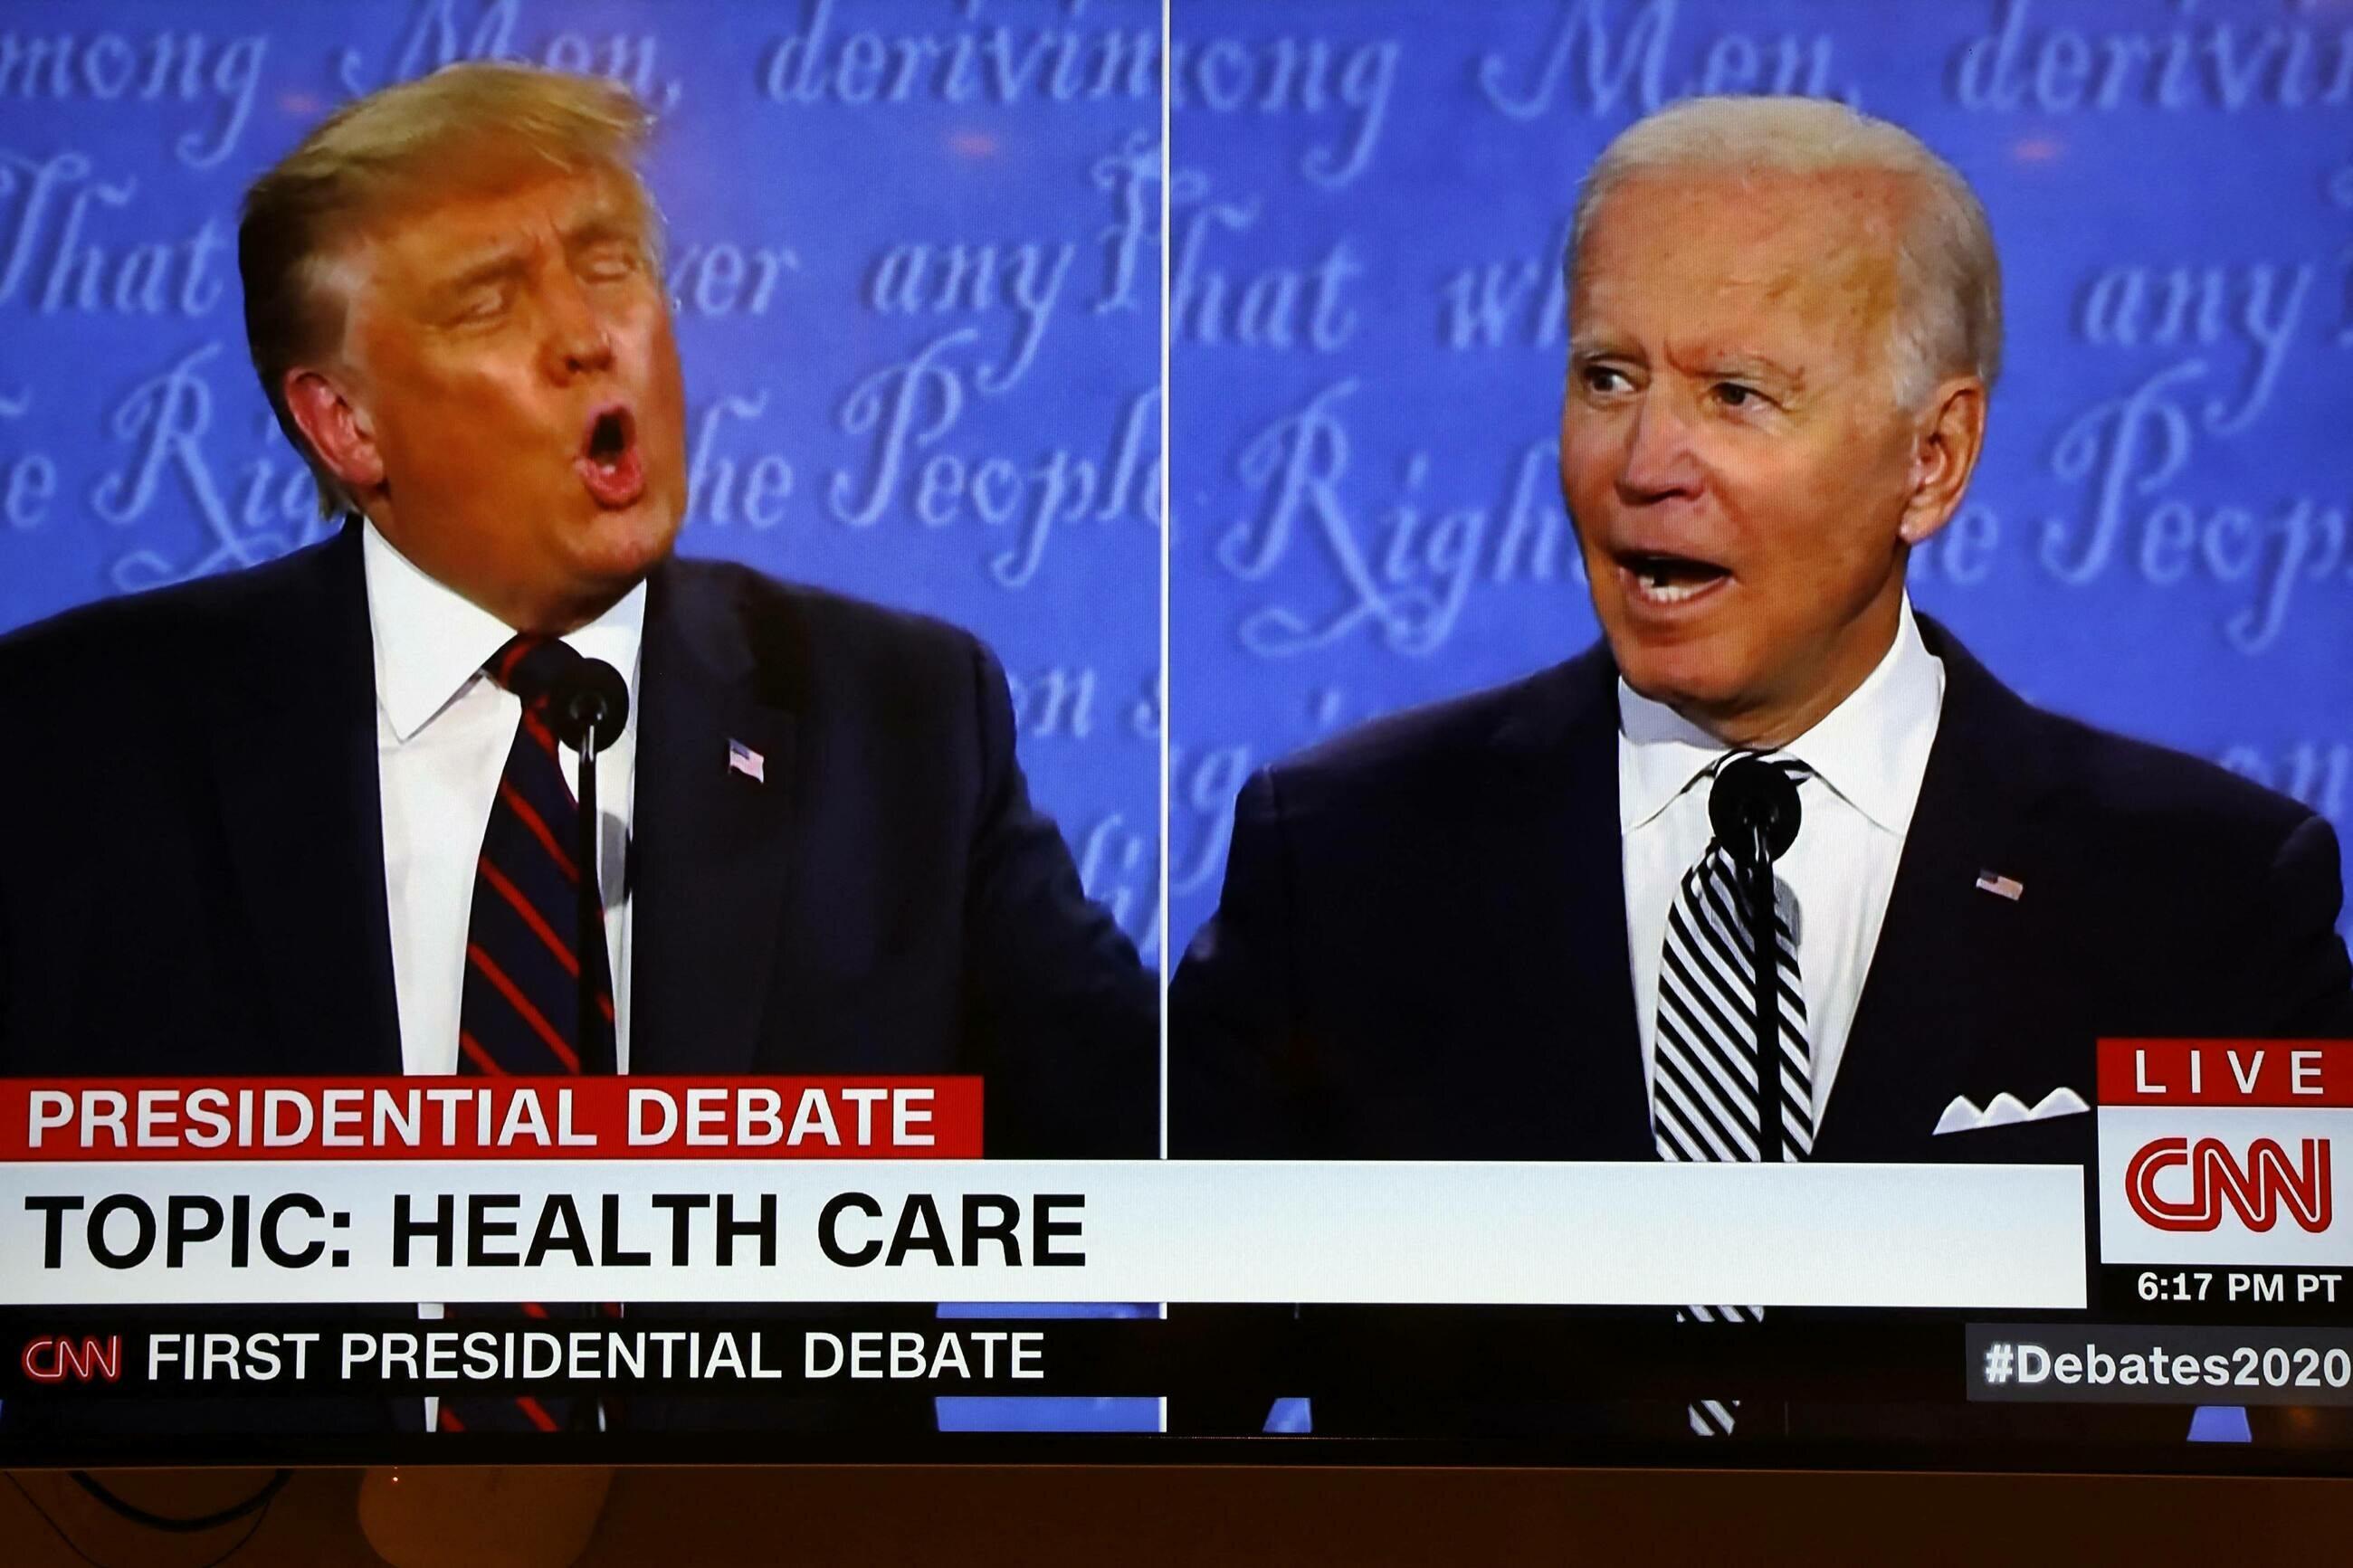 Donald Trump i Joe Biden w czasie debaty